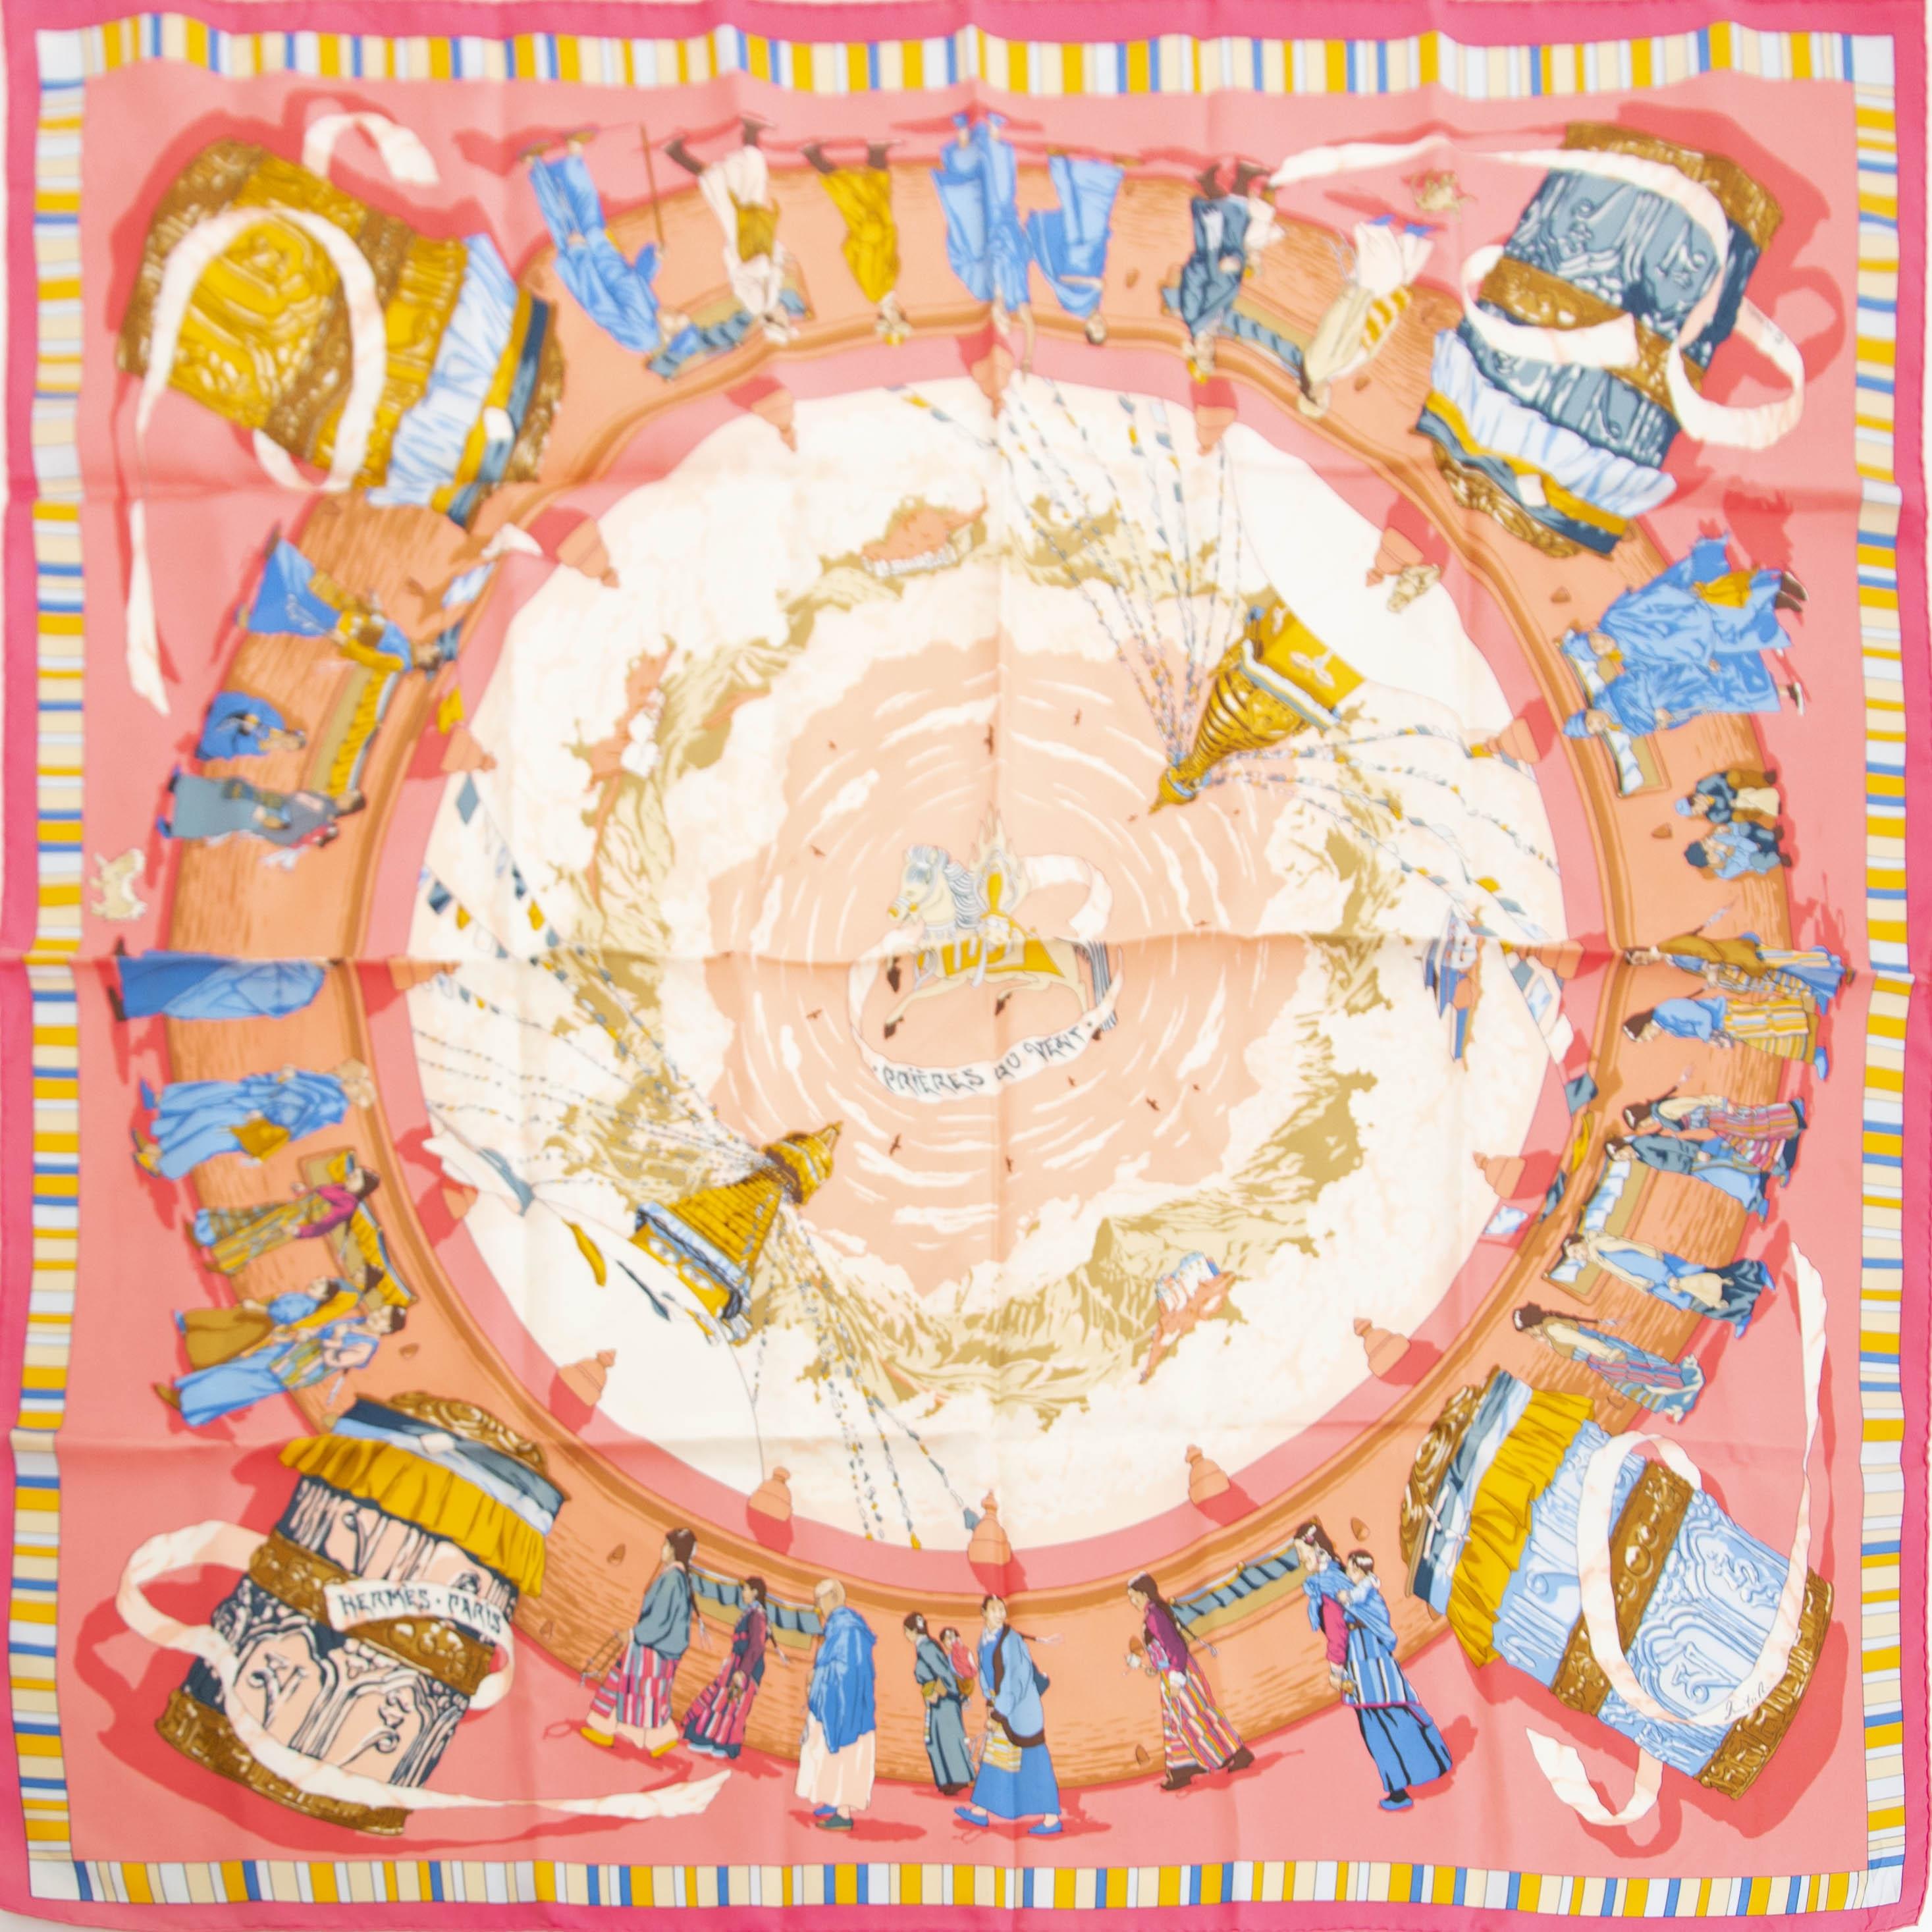 Koop authentieke tweedehands Hermès Carré Prières Au Vent Pink bij online webshop LabelLOV